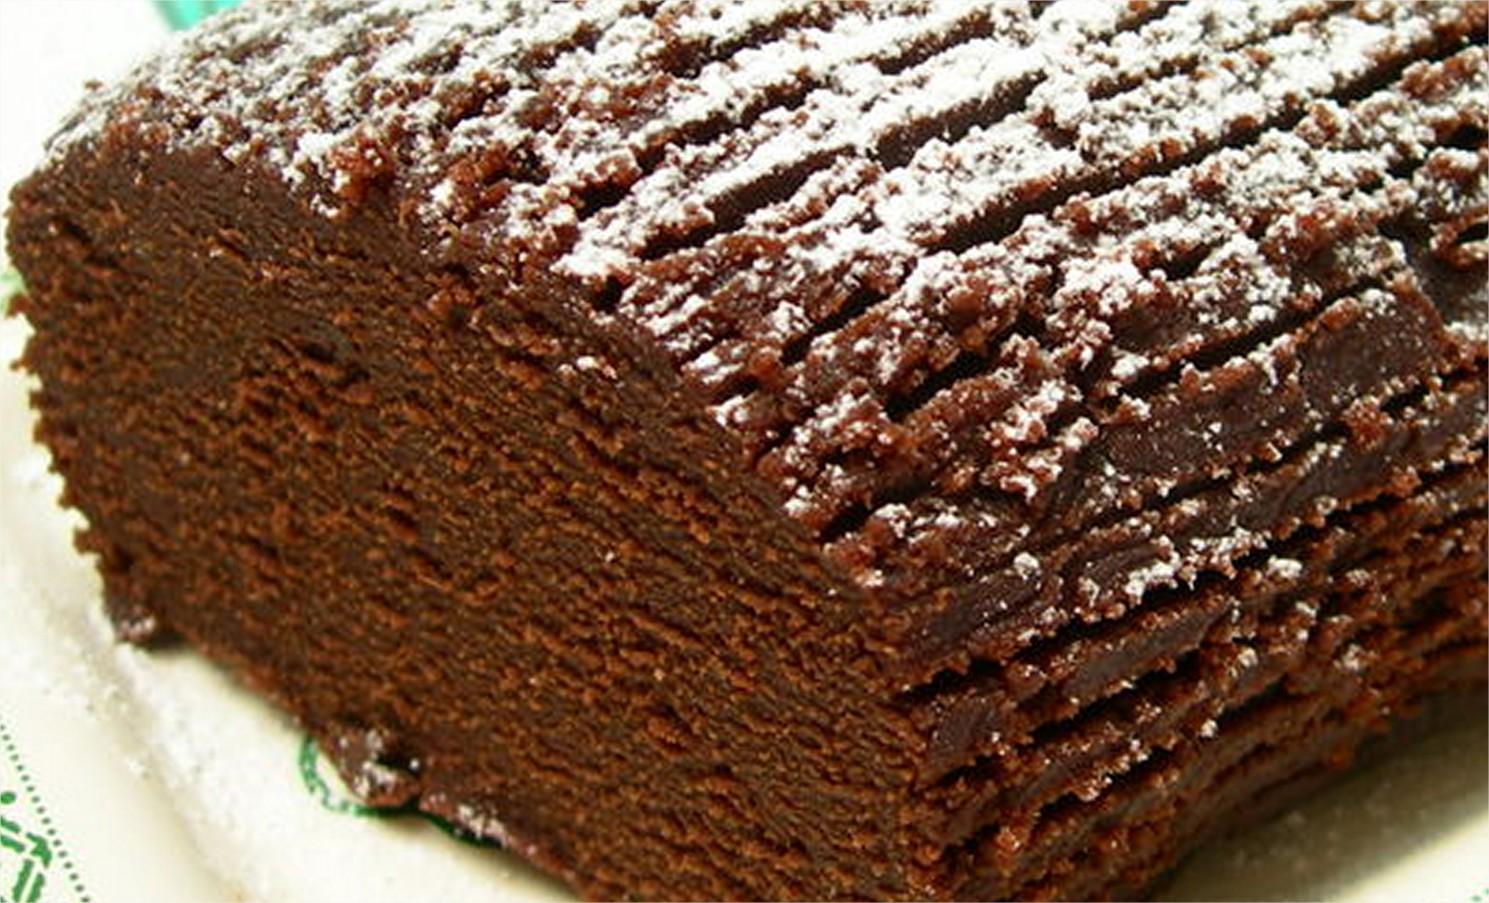 Buche chocolat et marron